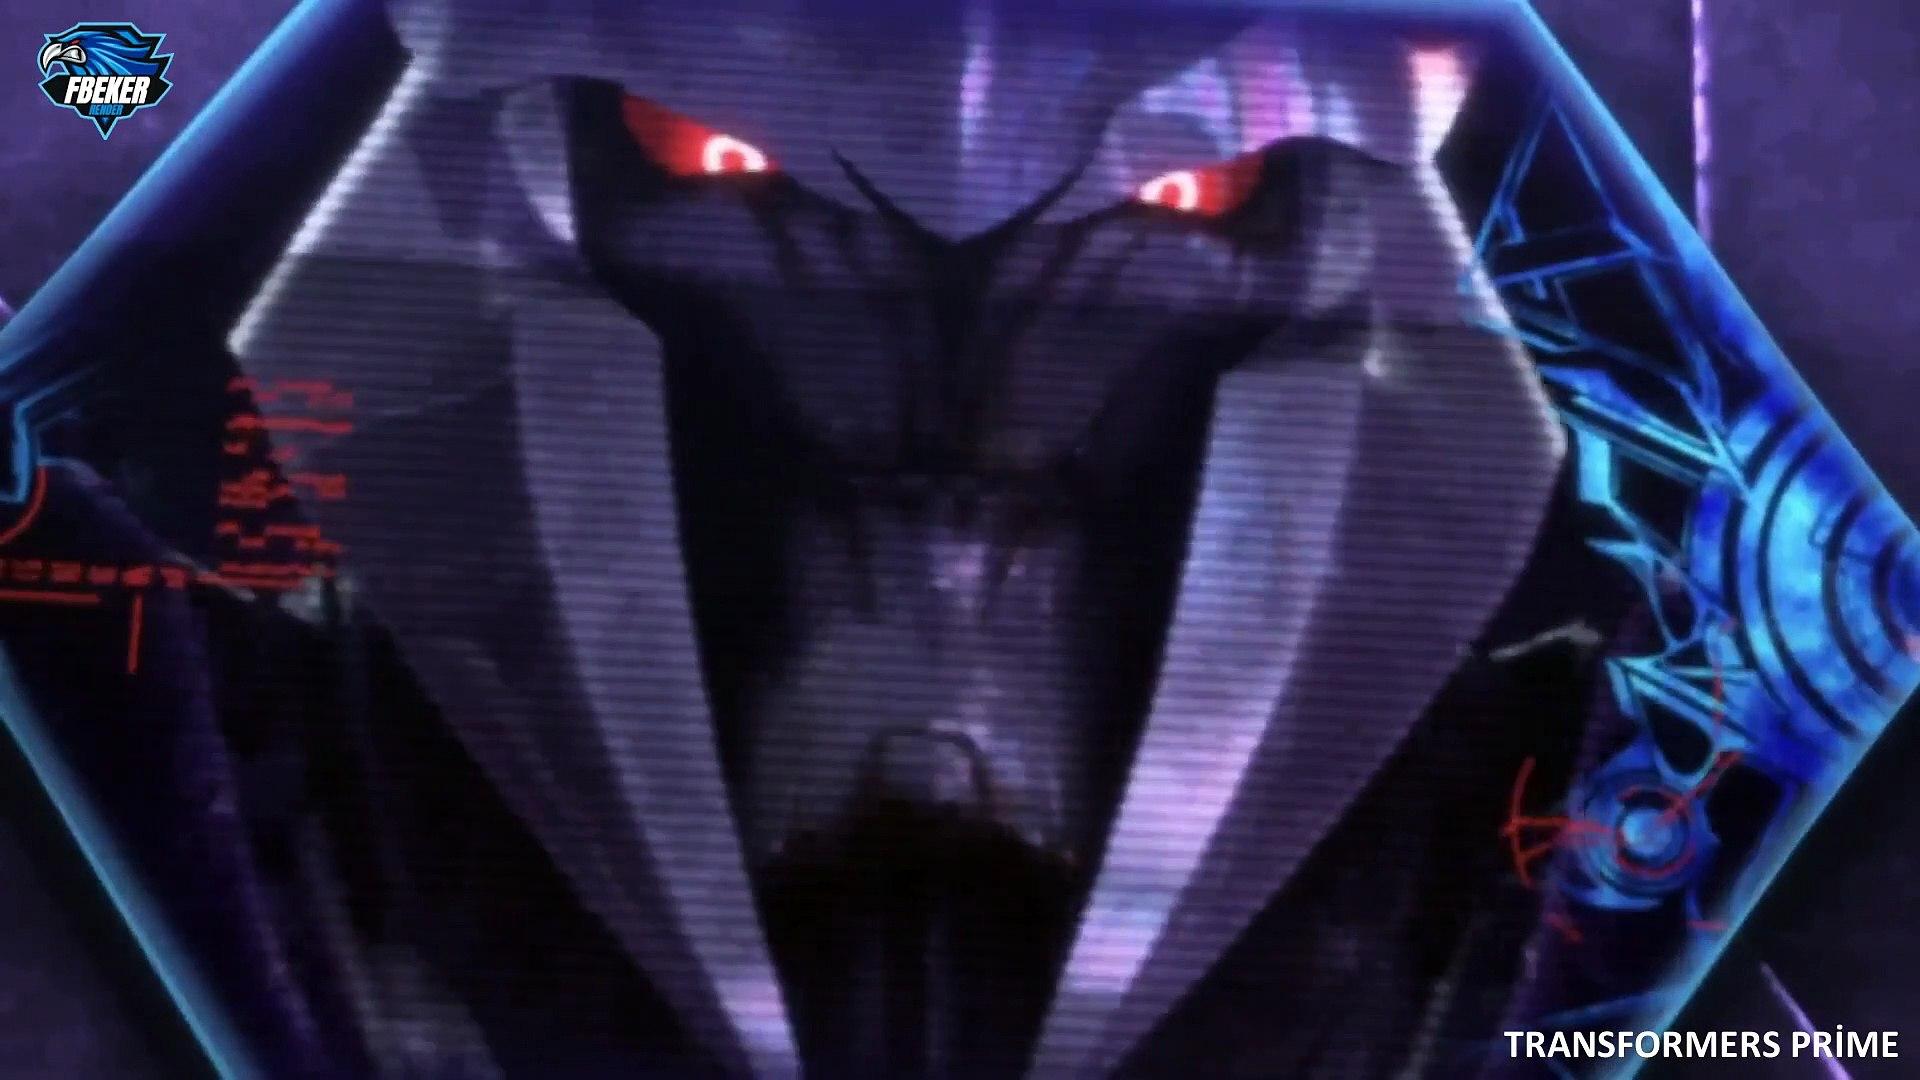 Transformers Prime 33.Bölüm Çapraz Ateş Full Hd